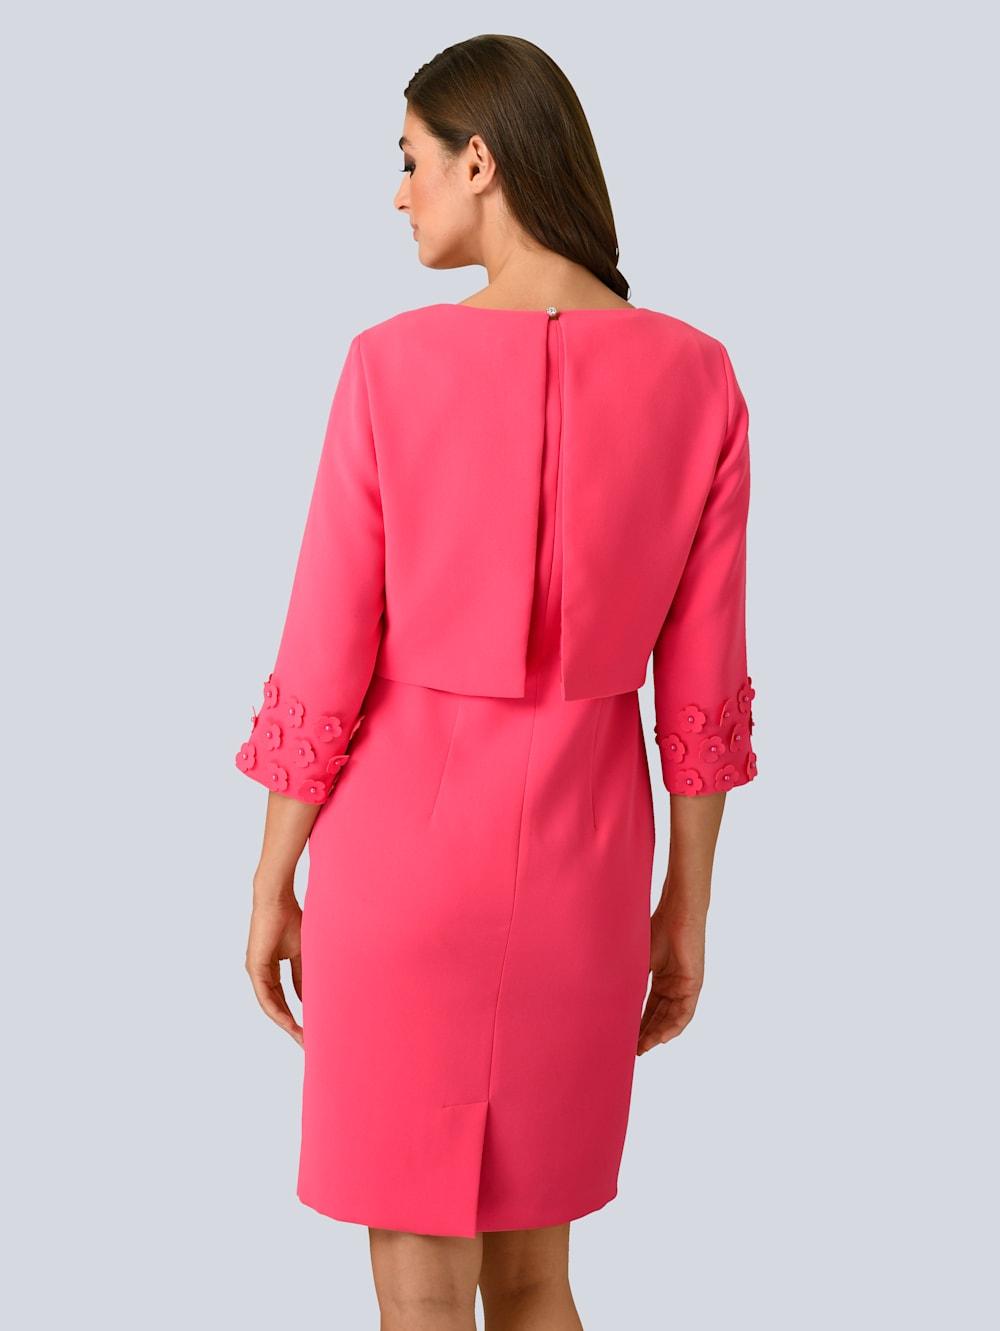 alba moda kleid mit edler kurz-jacke im set | alba moda